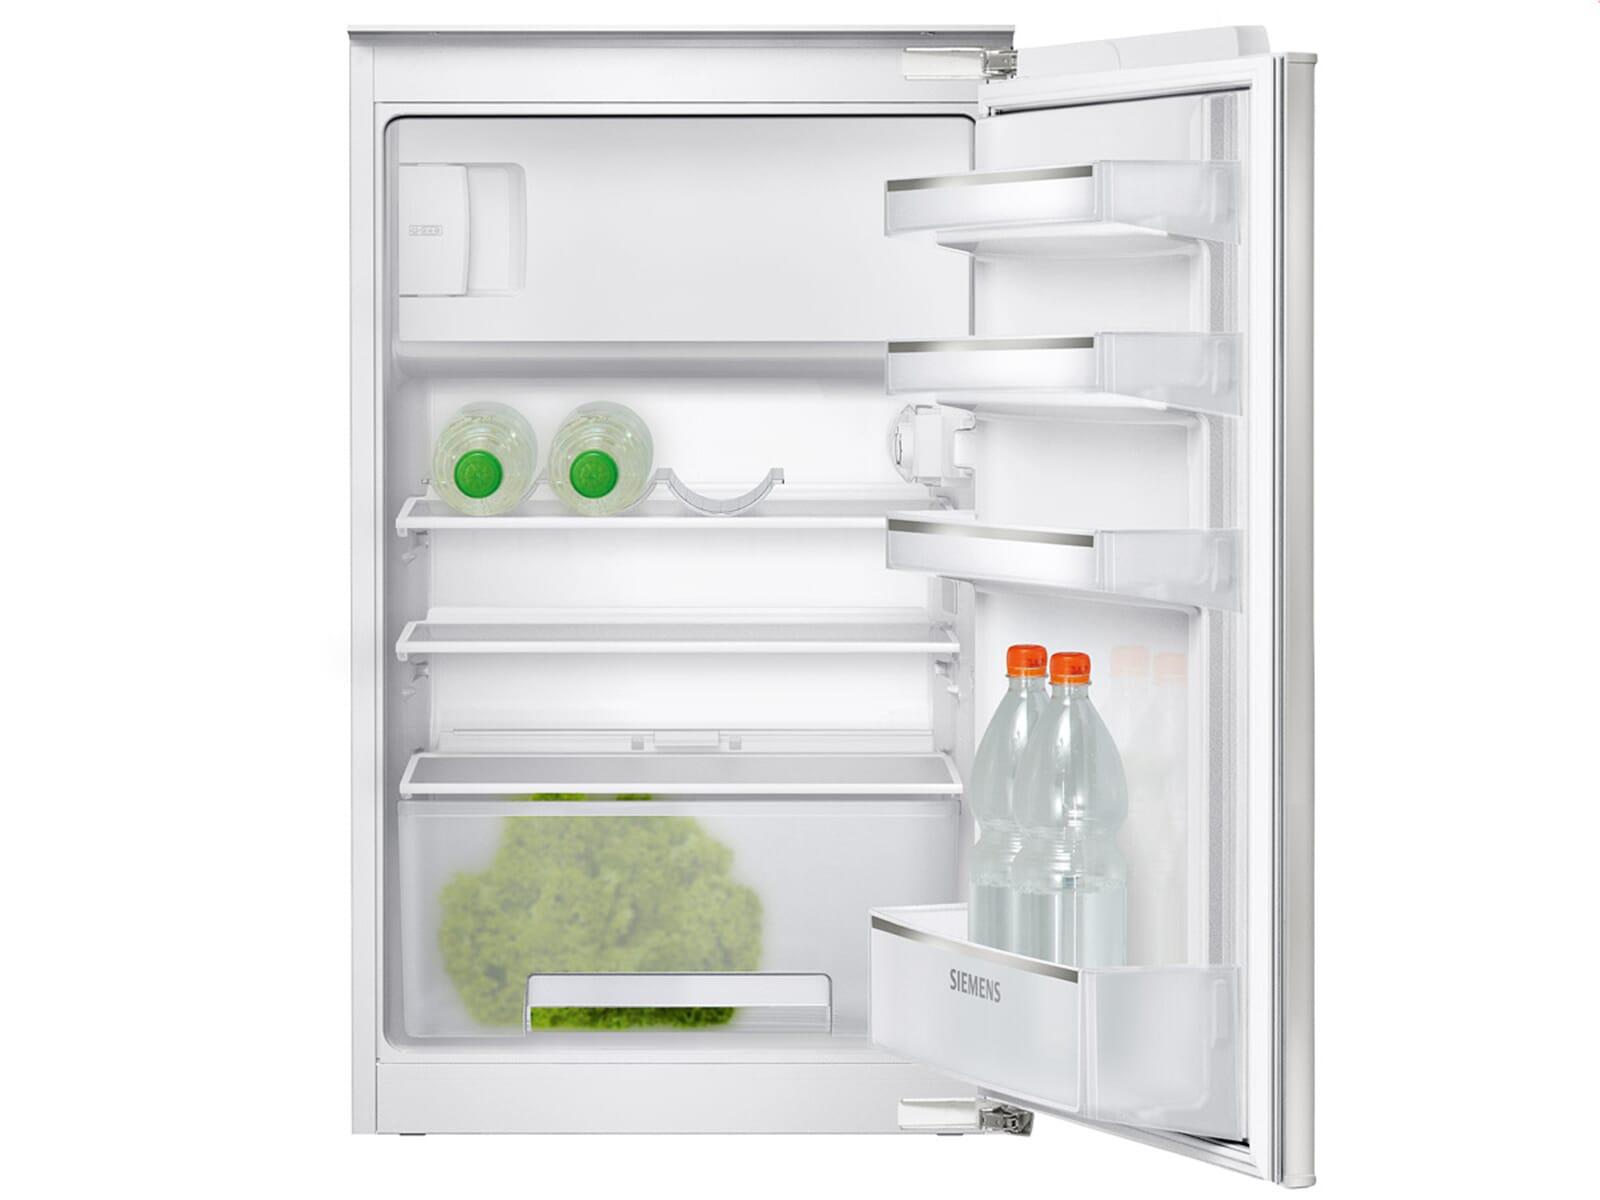 Siemens KI18LV62 Einbaukühlschrank